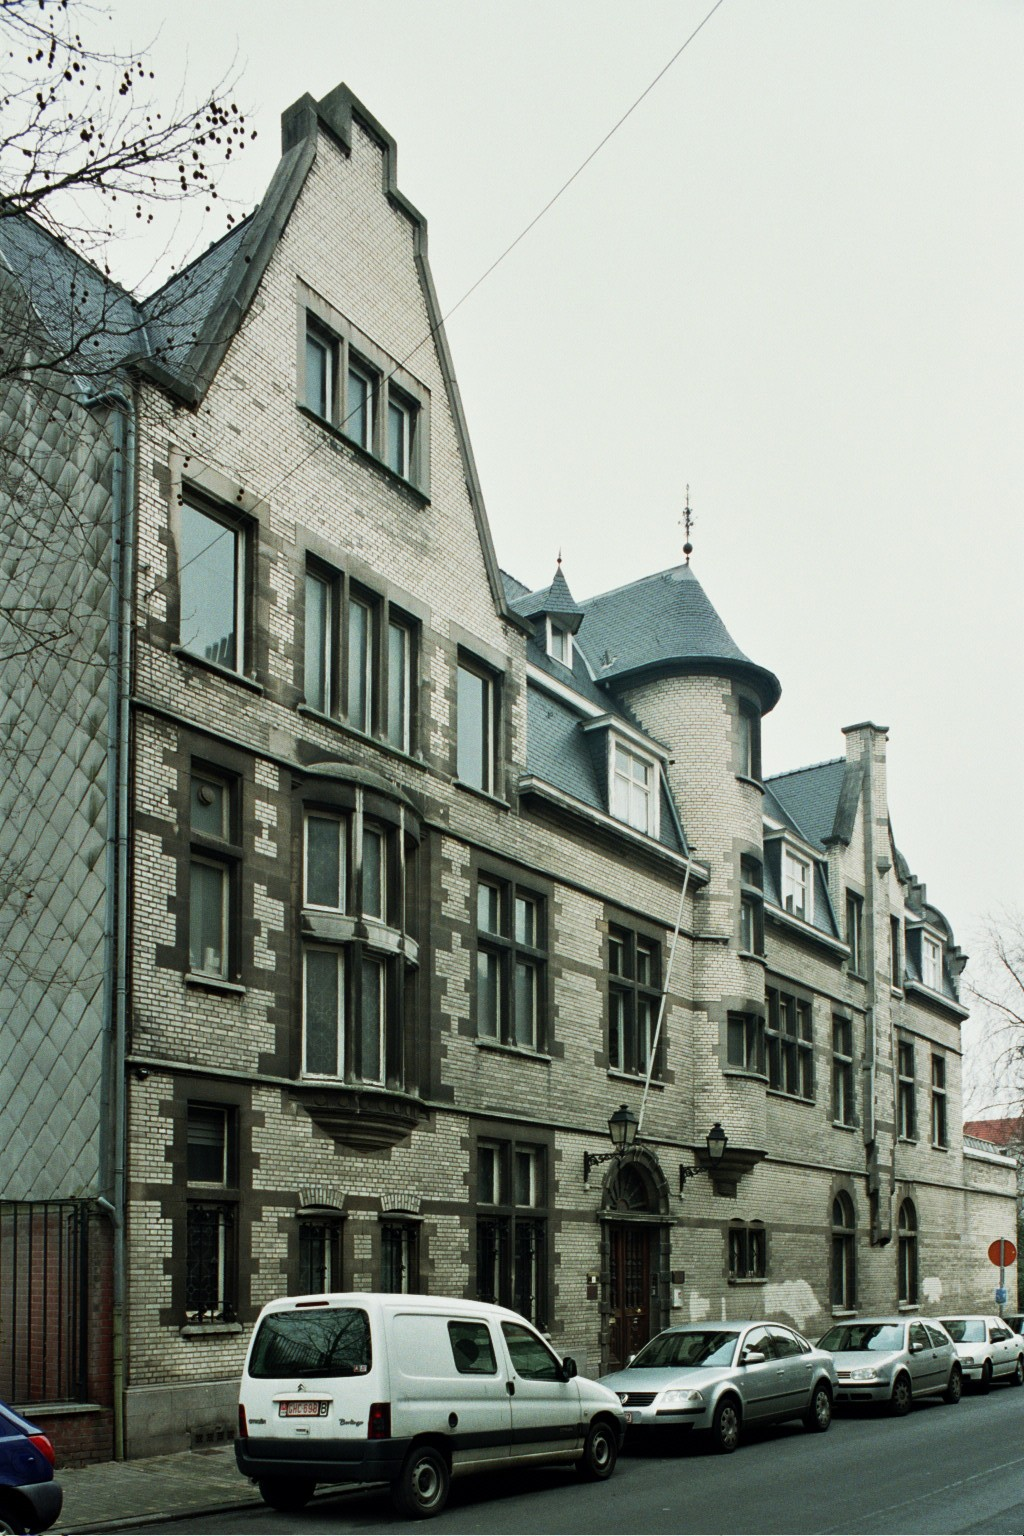 Parmastraat 69, Pelgrimshuis., 2004